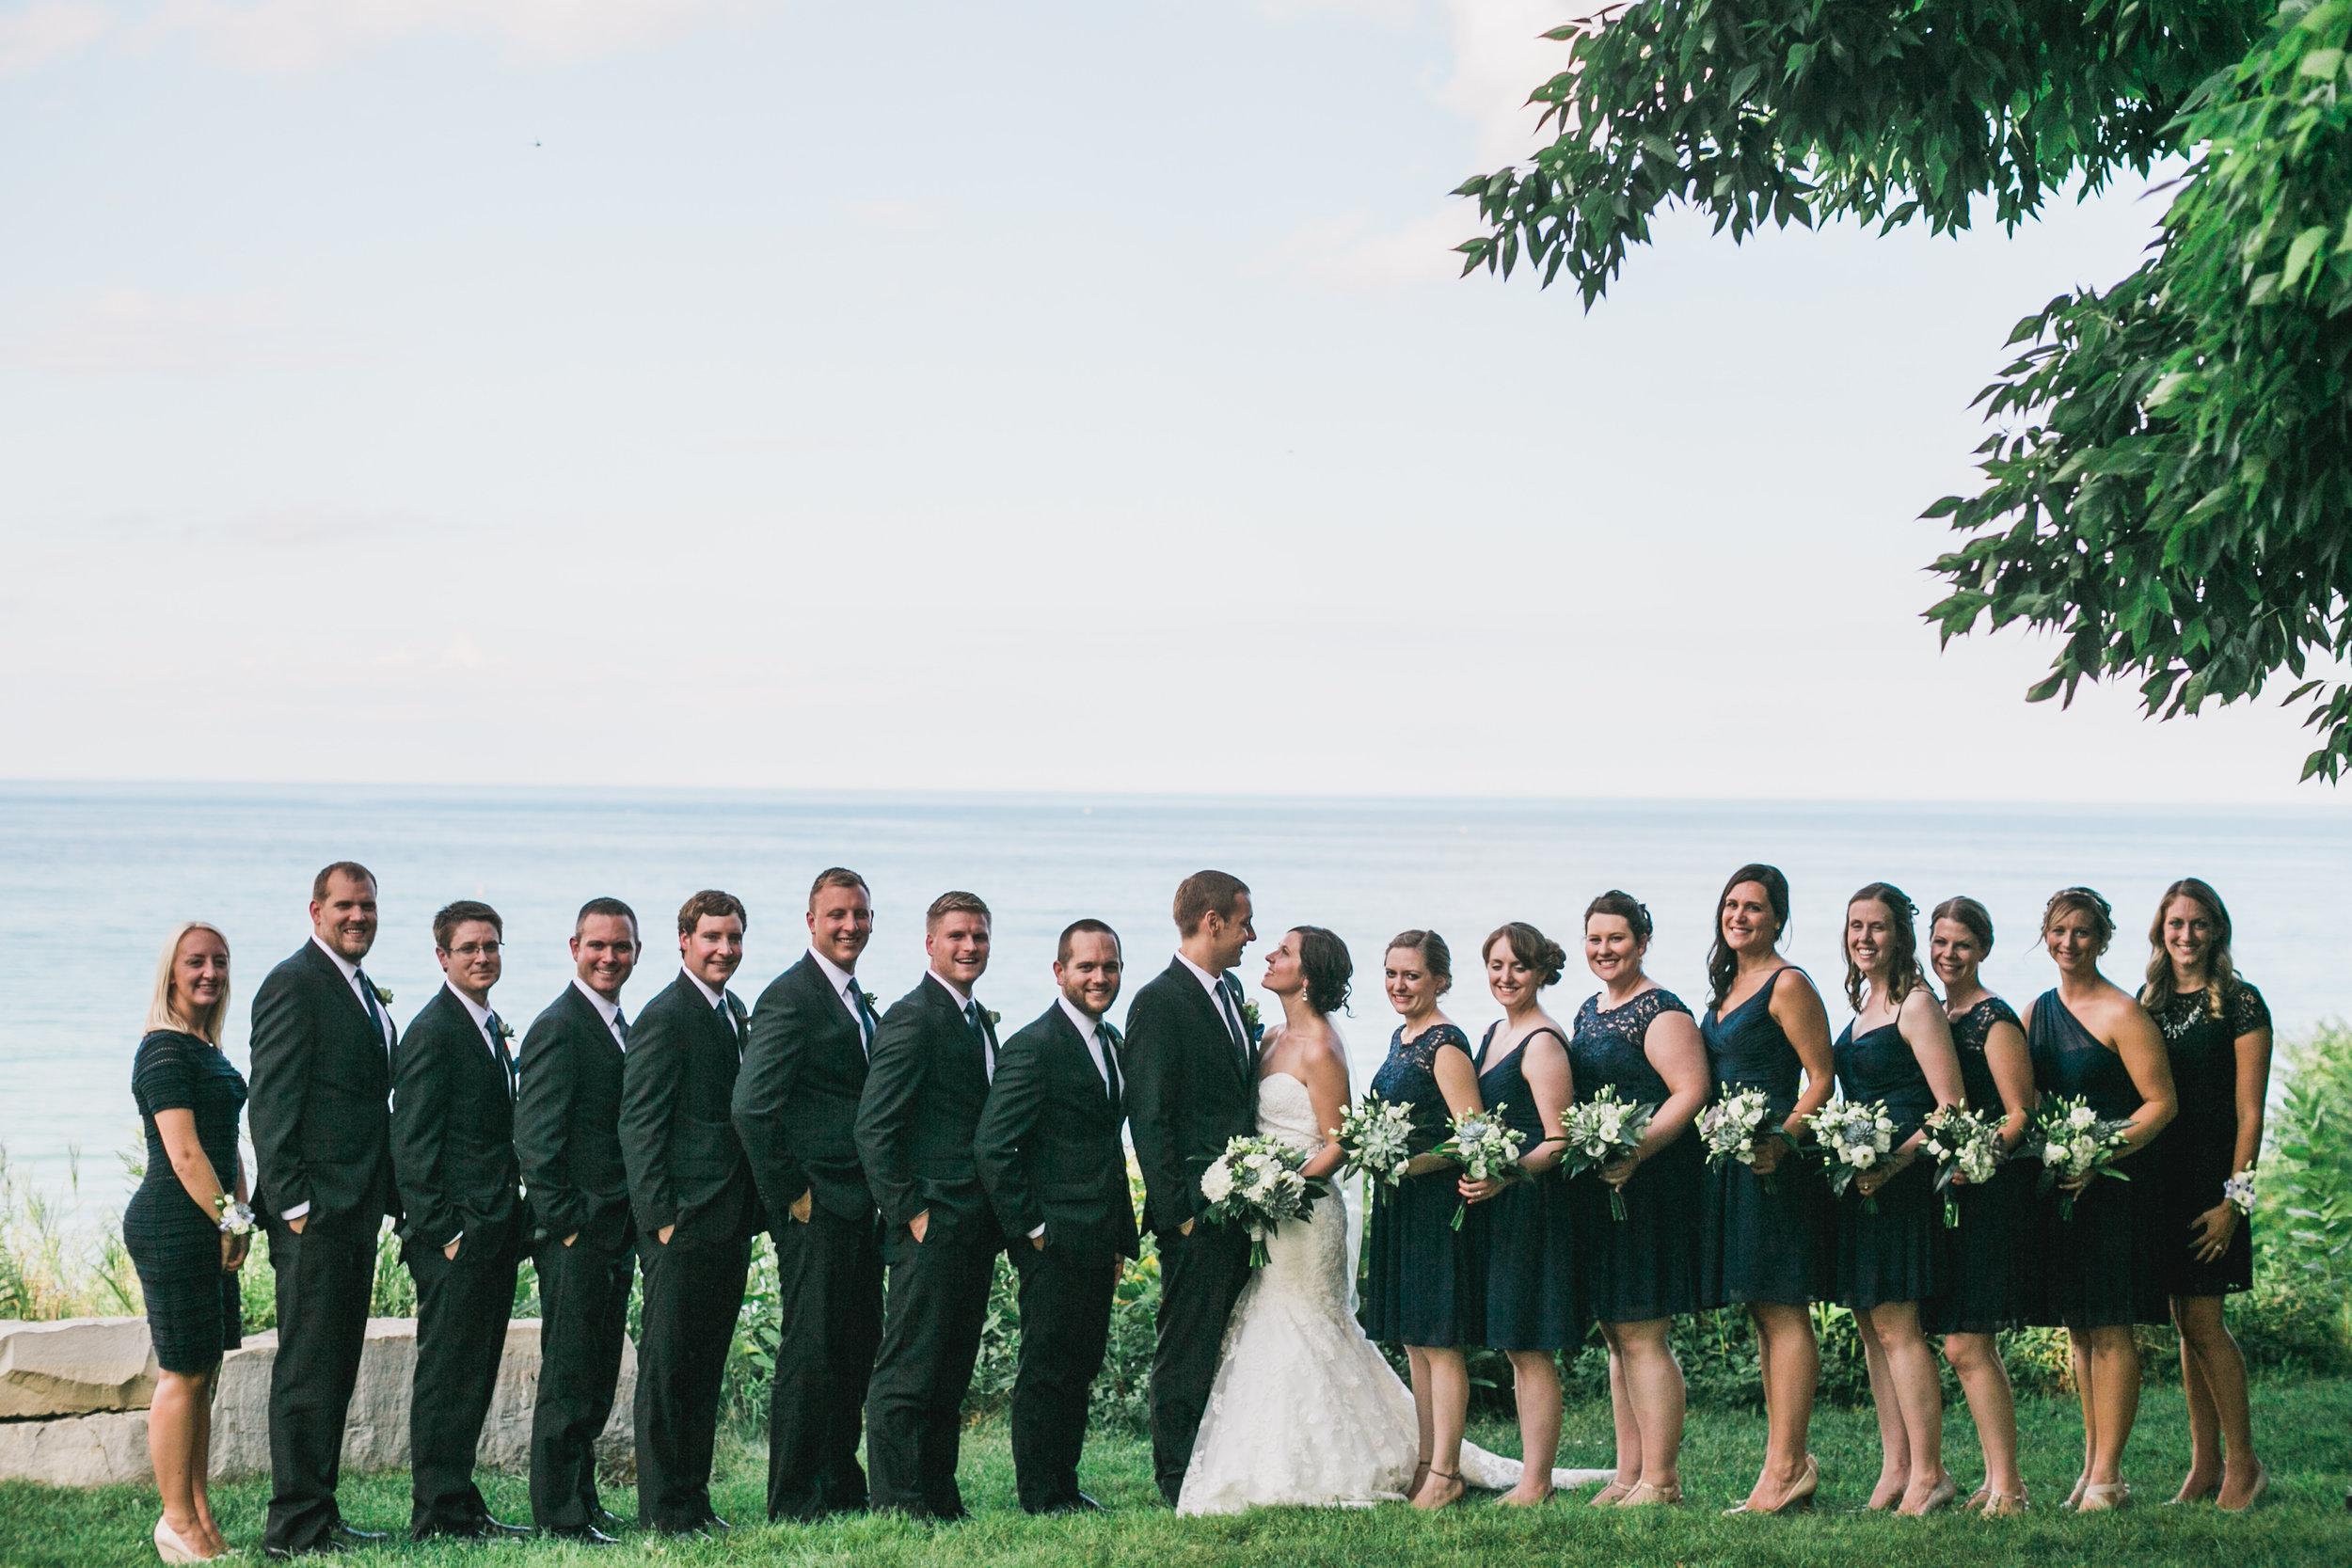 wisconsin-wedding-acowsay-uttke-photography-42.jpg